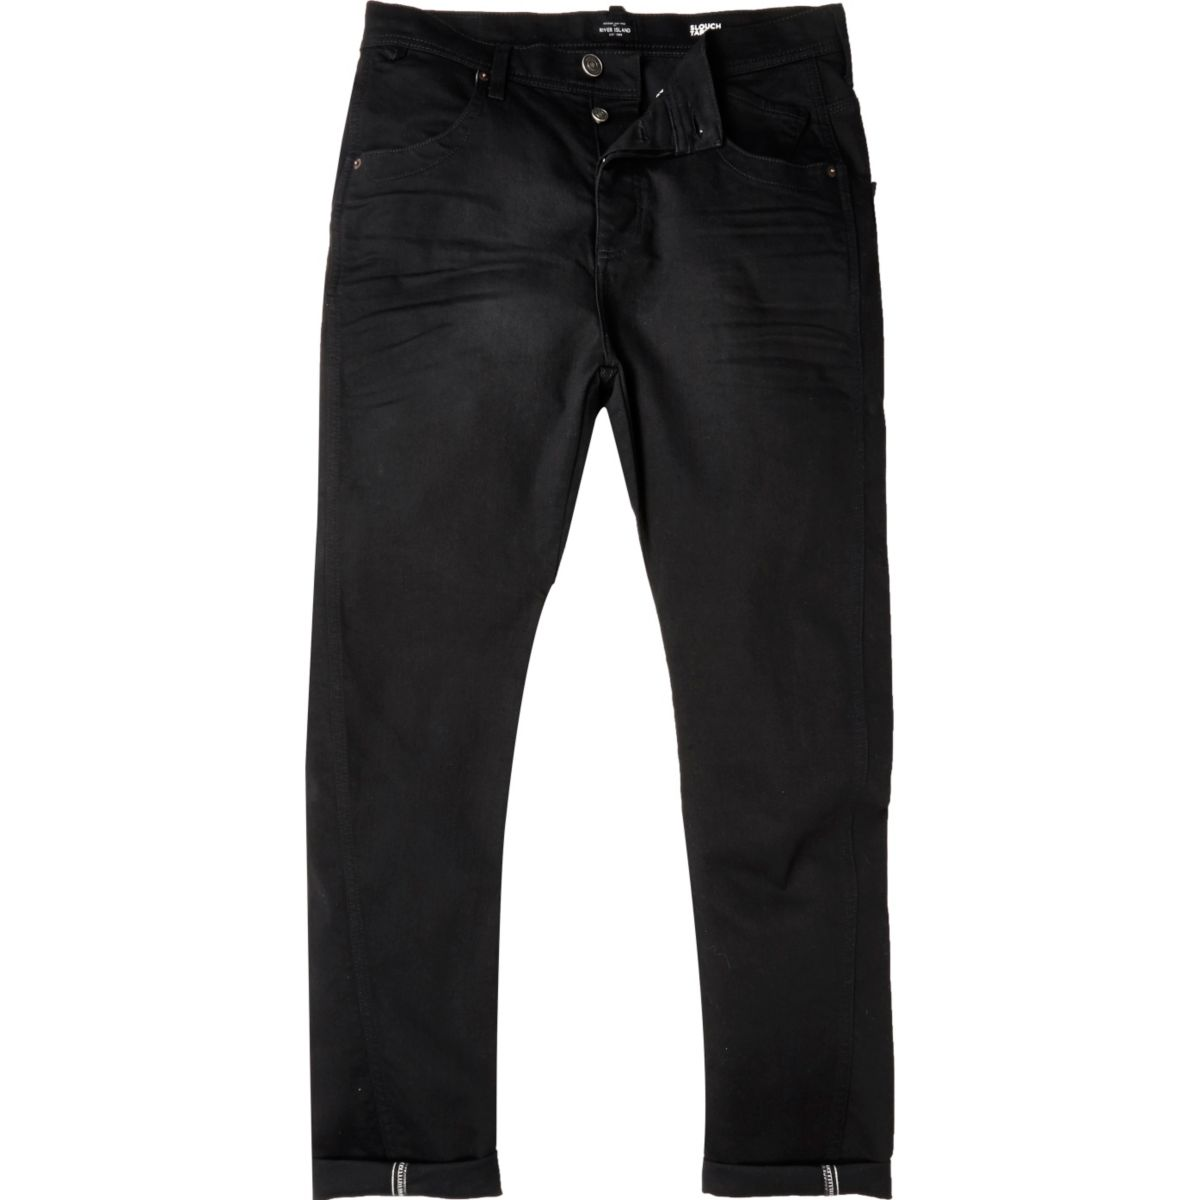 Black Tony slouch taper jeans